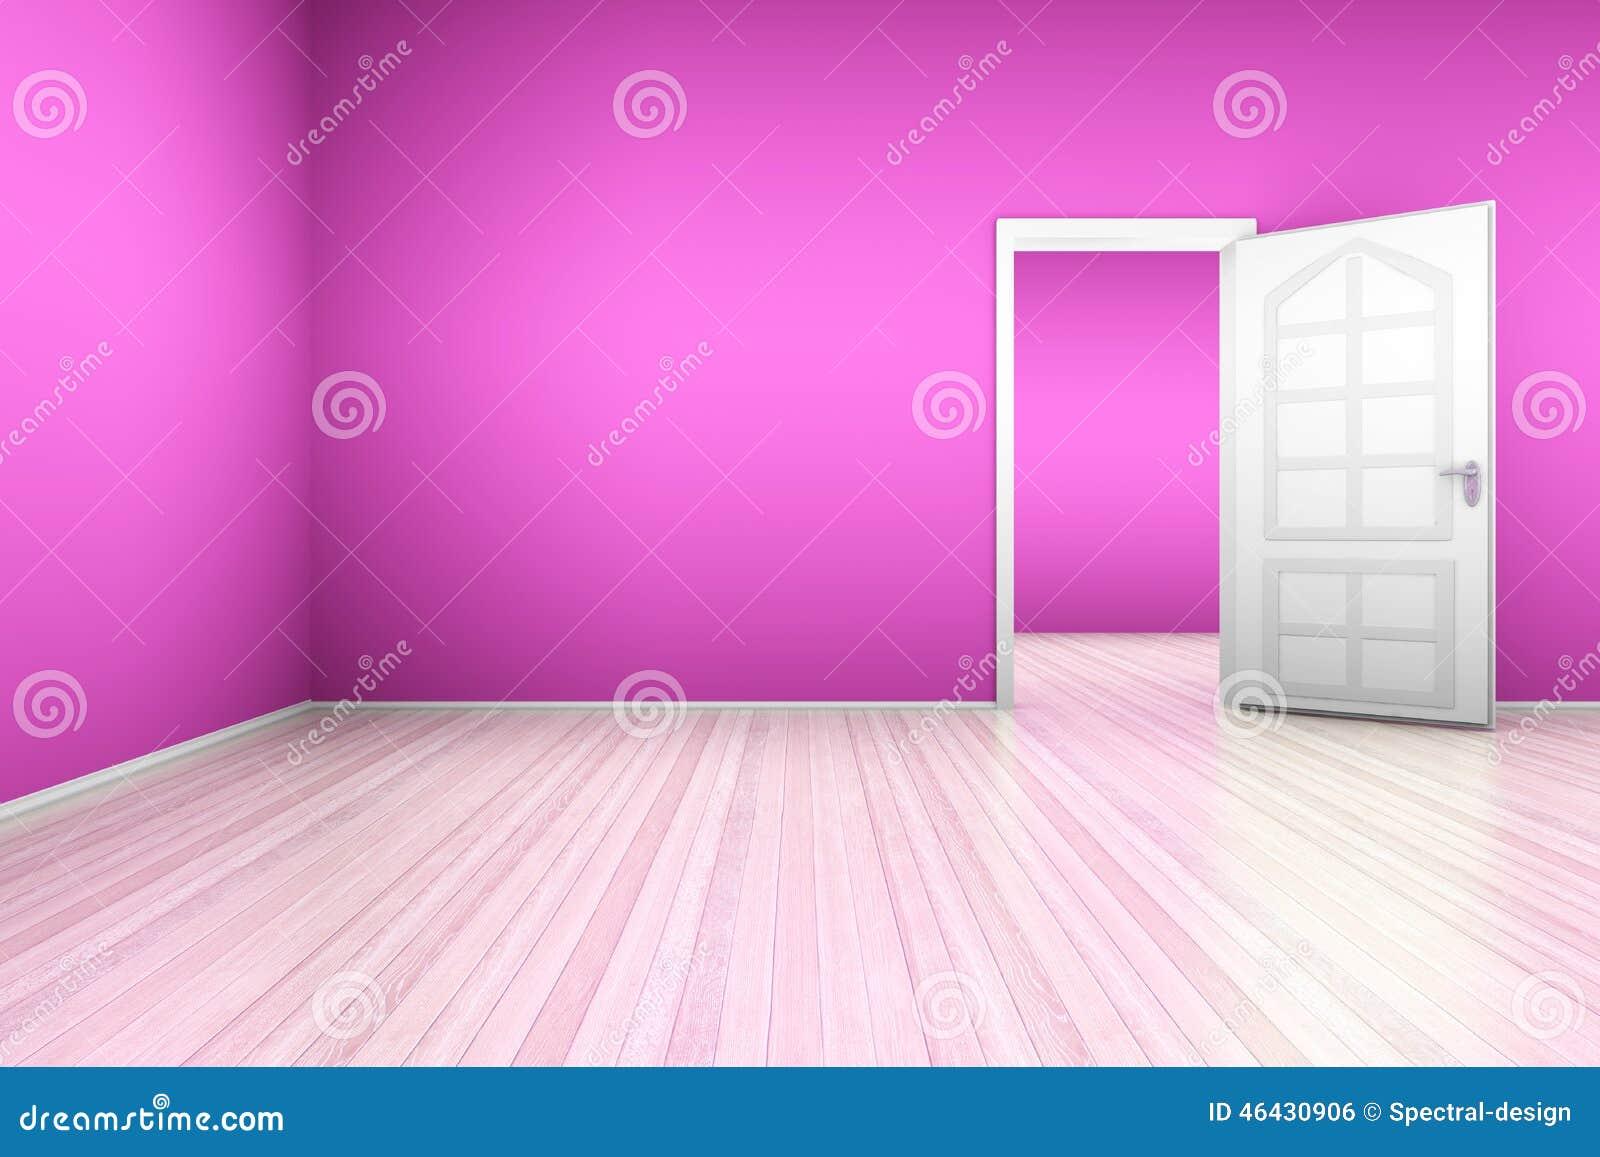 Rosa Wohnung Stock Abbildung - Bild: 46430906